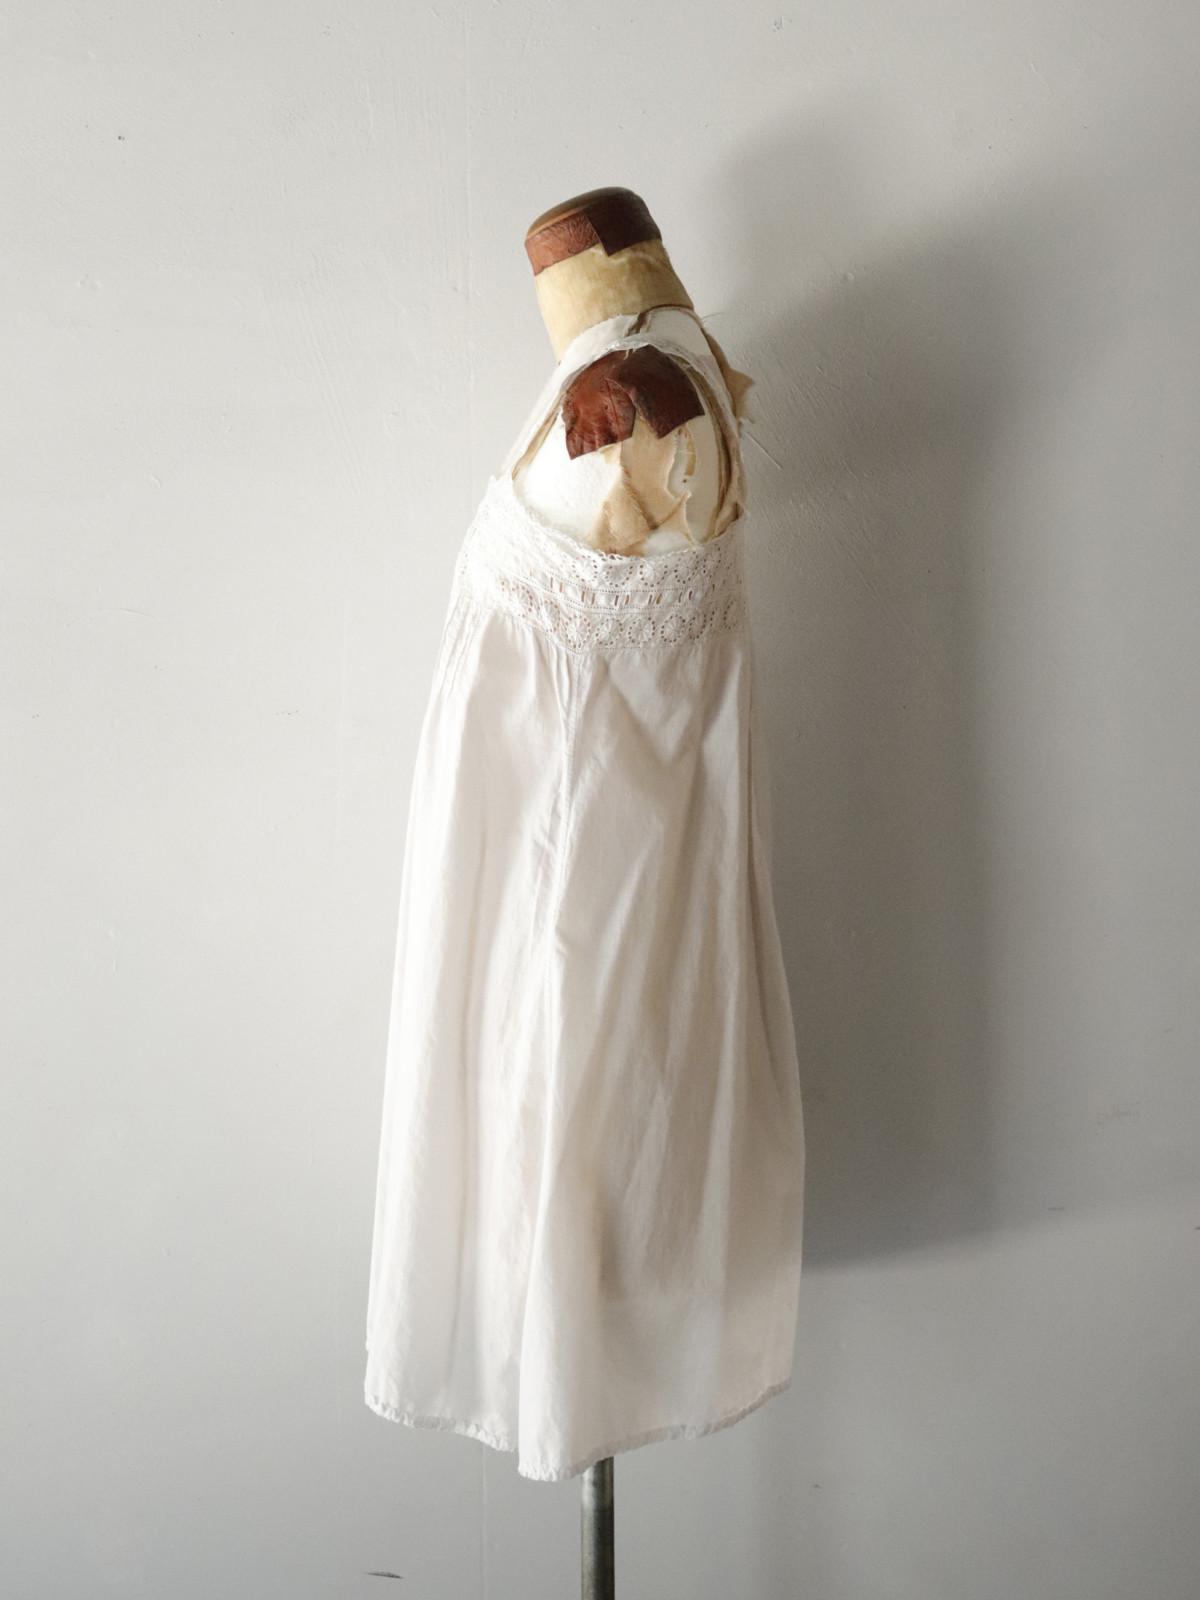 _vintage,europe,linen,cotton,nightwear,lace,enbroidery,camisole